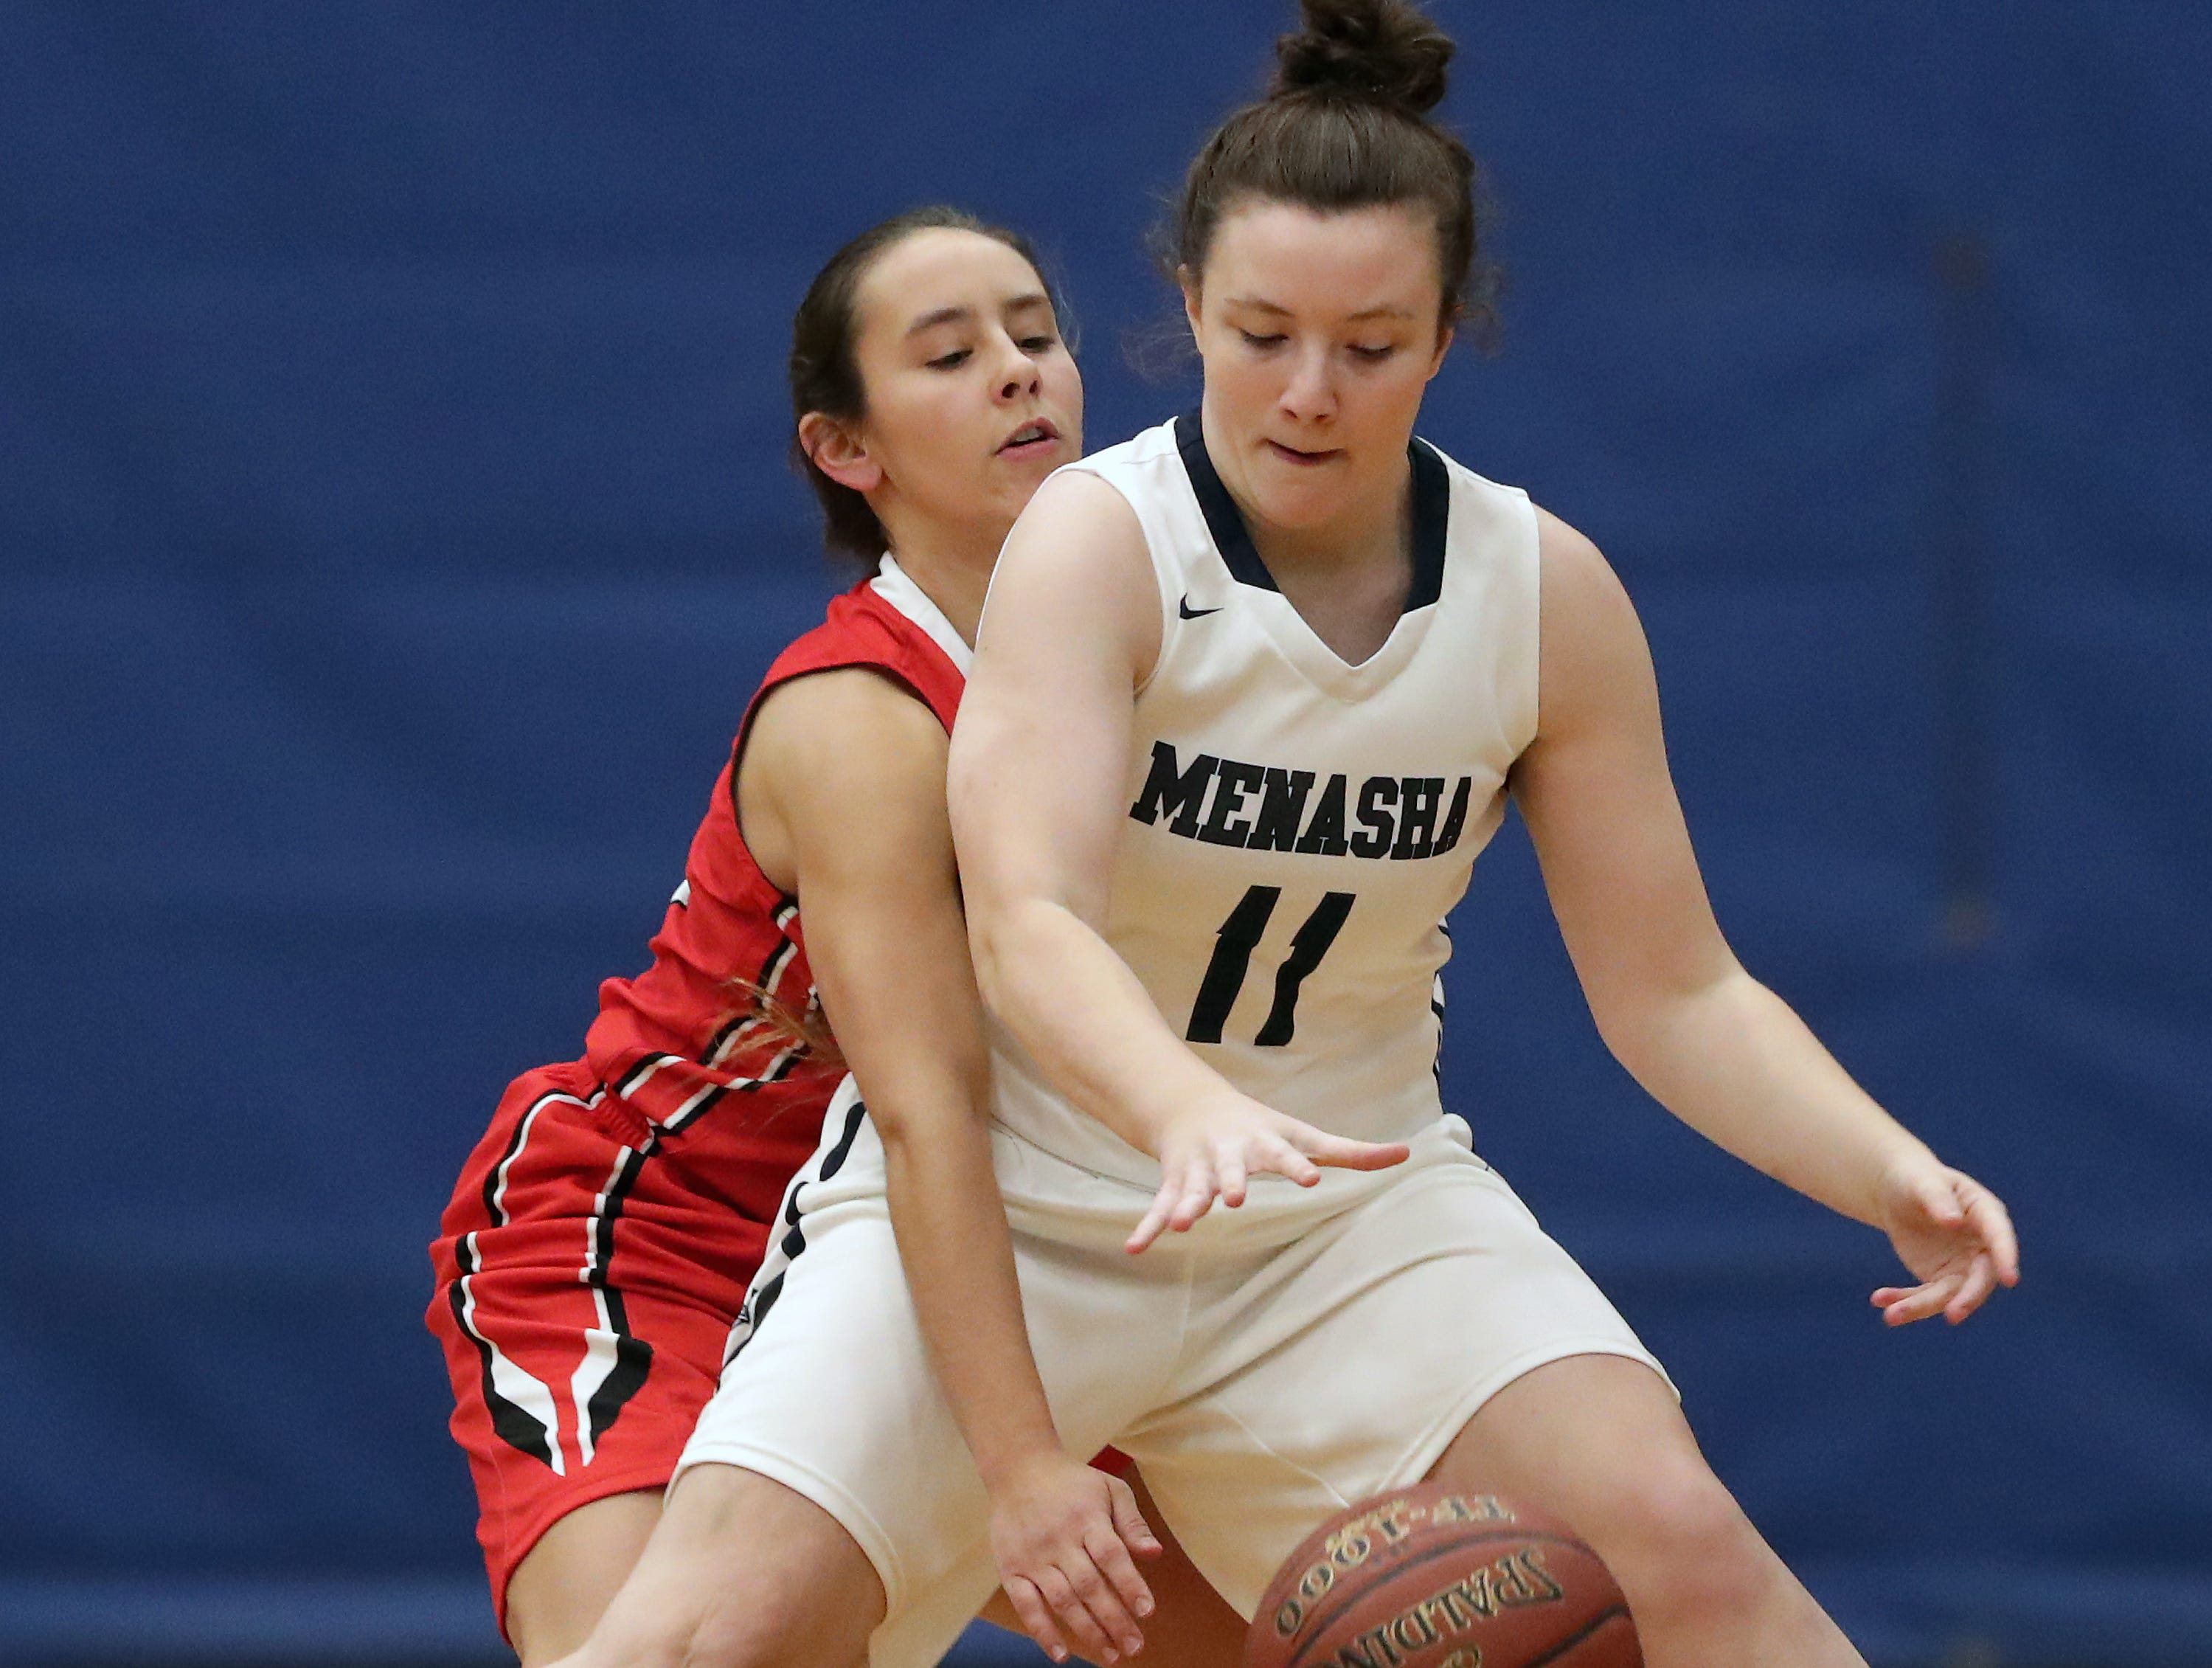 New London High School's #24 Samantha Pfefferle against Menasha High School's #11 Alyssa Roen during their girls basketball game on Friday, December 14, 2018, in Menasha, Wis.Wm. Glasheen/USA TODAY NETWORK-Wisconsin.